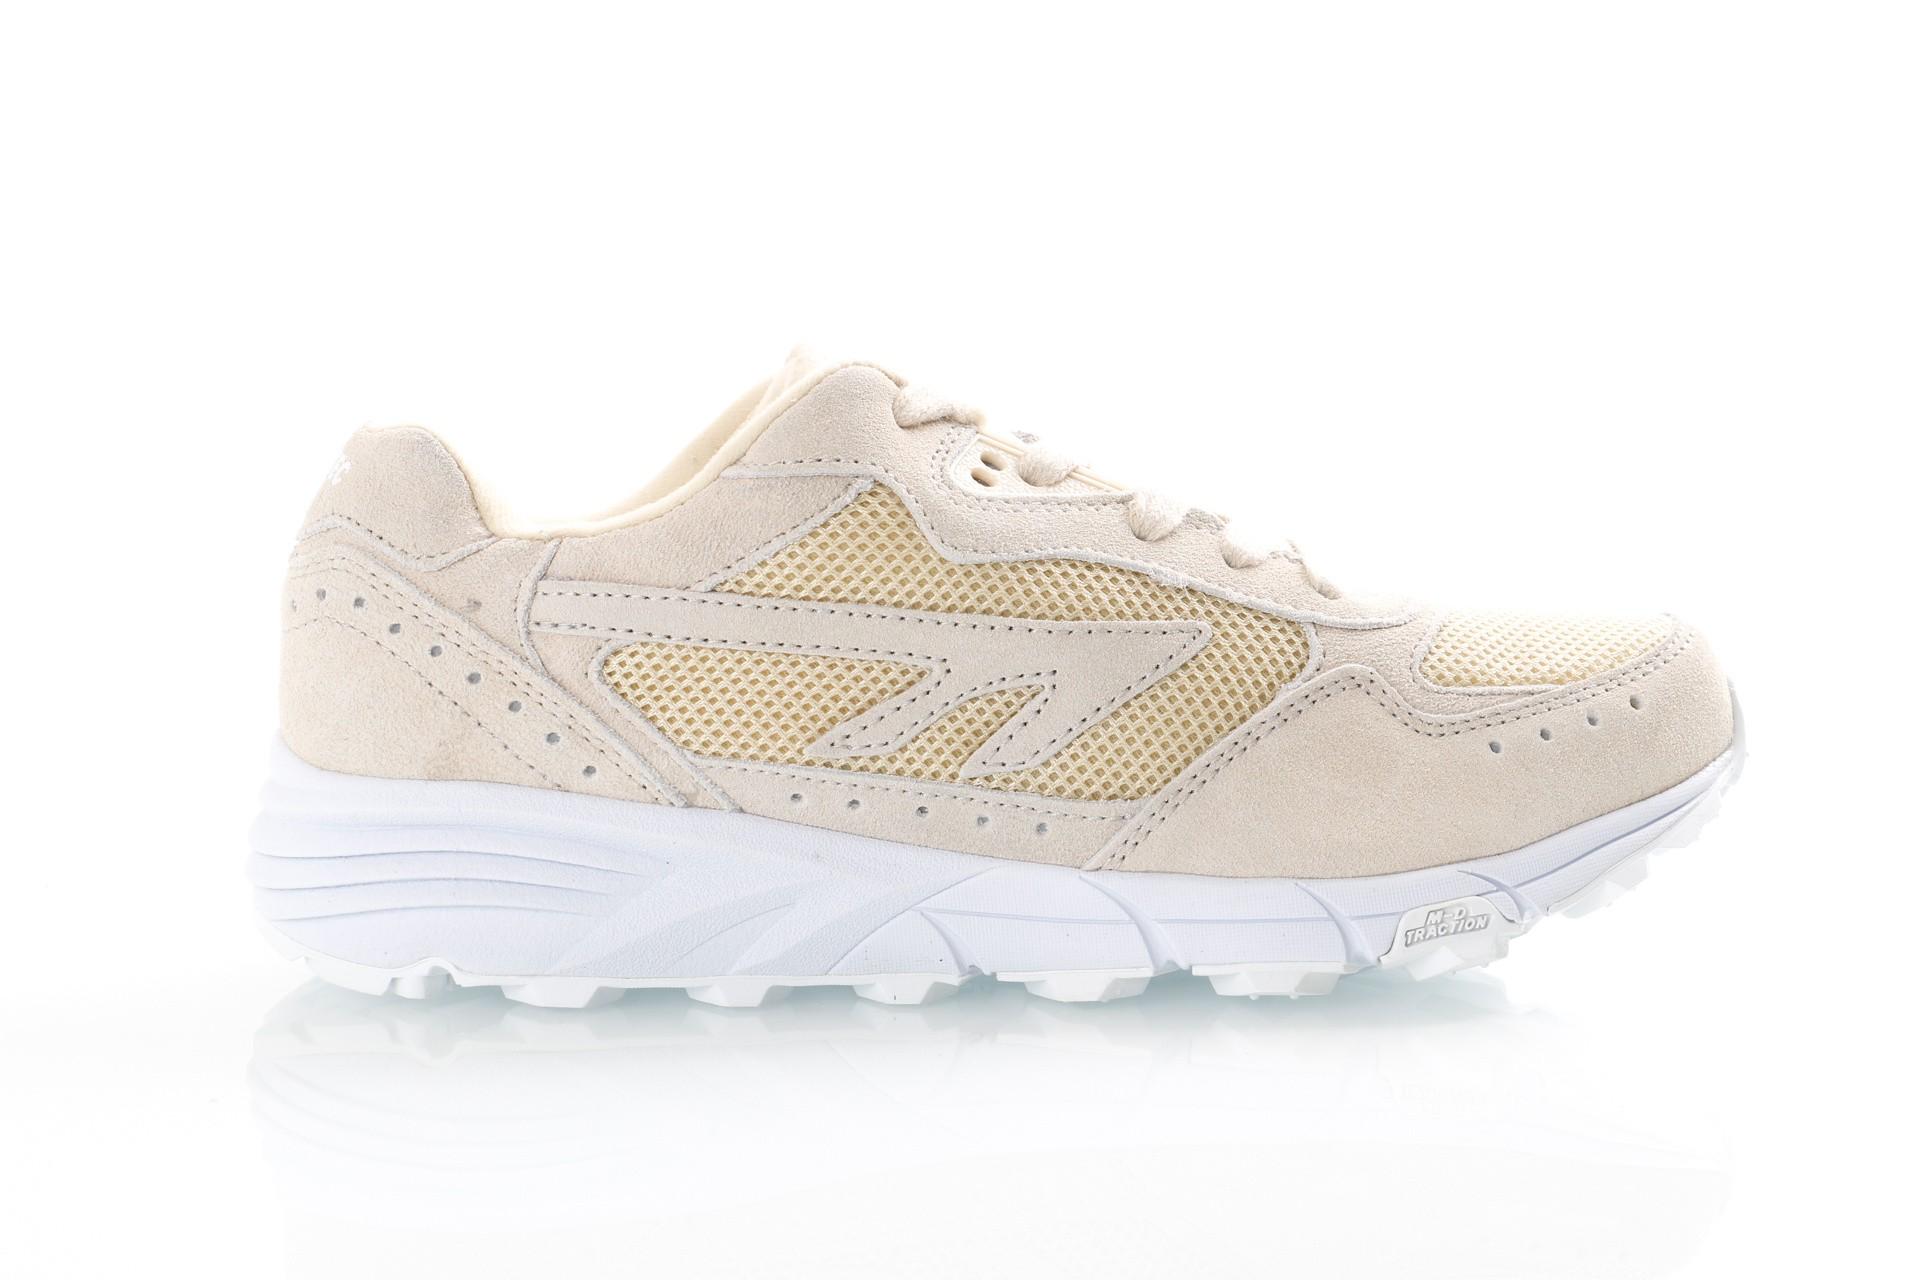 Foto van Hi-Tec Shadow Tl S010005/012 Sneakers Cream/White